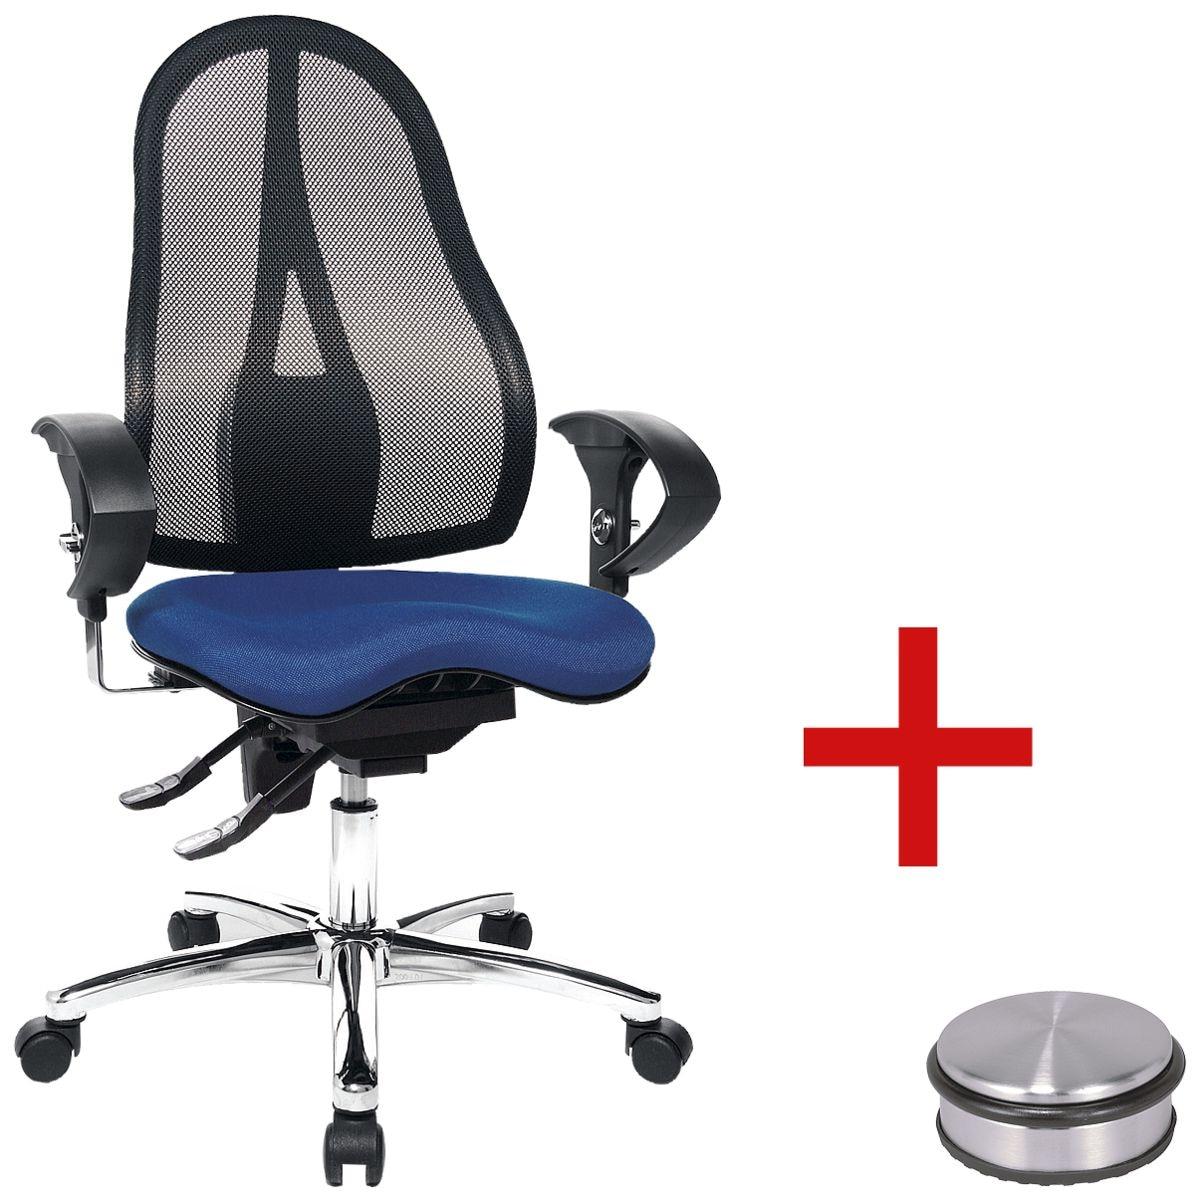 b rostuhl topstar sitness 15 mit armlehnen inkl t rstopper disc bei otto office g nstig. Black Bedroom Furniture Sets. Home Design Ideas